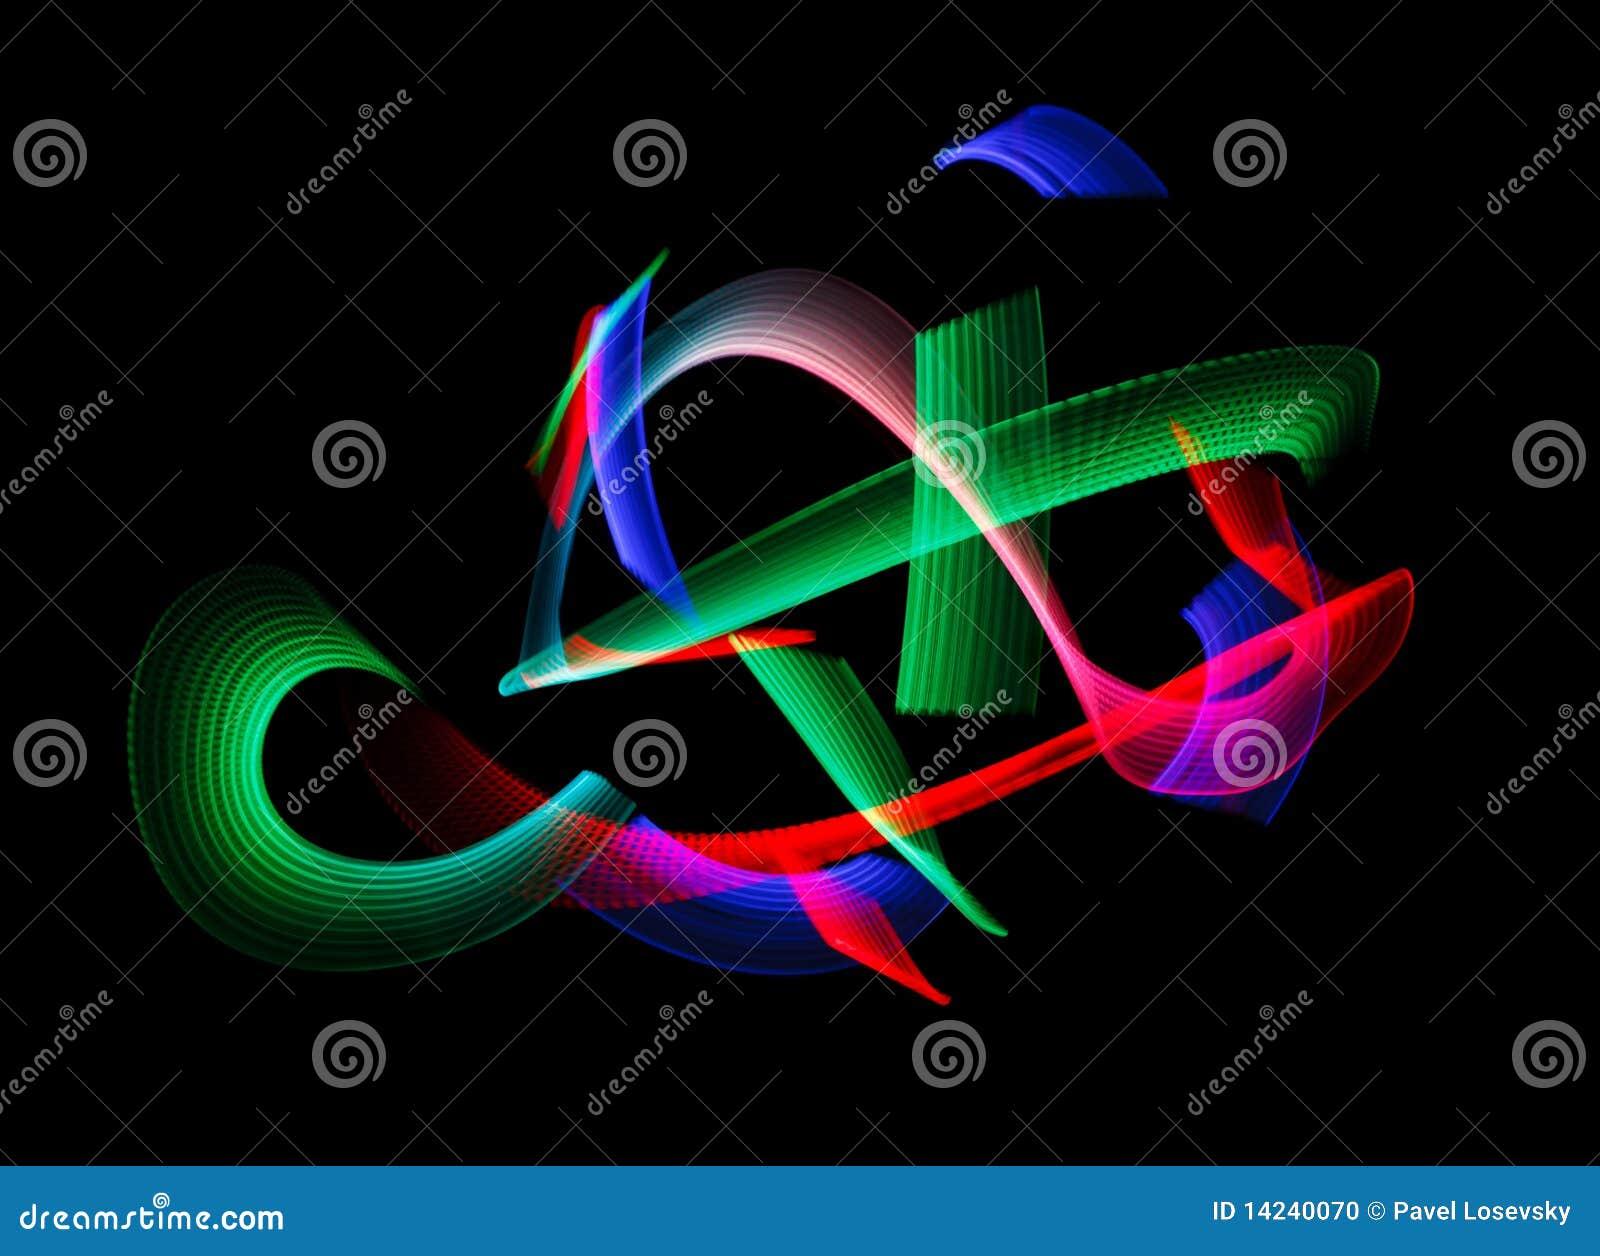 leuchtende farben des regenbogens schleppen auf schwarzem stockfoto bild 14240070. Black Bedroom Furniture Sets. Home Design Ideas